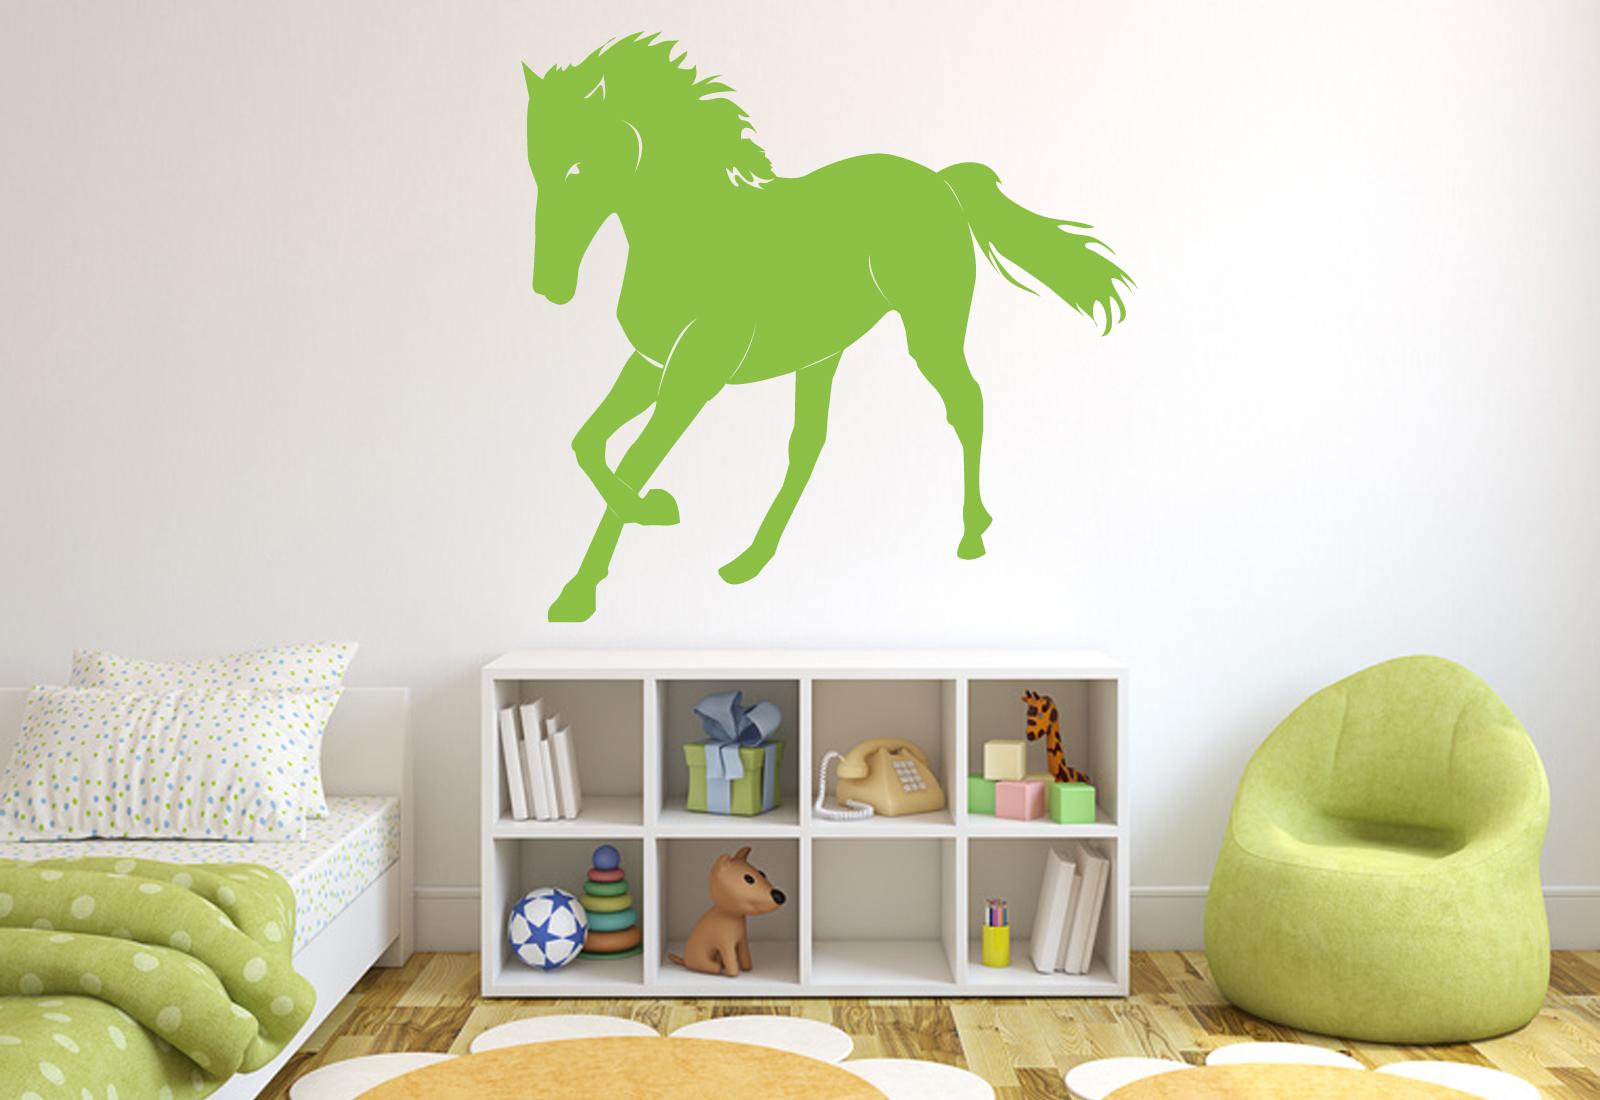 Full Size of Wandtattoo Kinderzimmer Pferd Galopp 3 Ab 20 Regal Sofa Regale Weiß Kinderzimmer Kinderzimmer Pferd